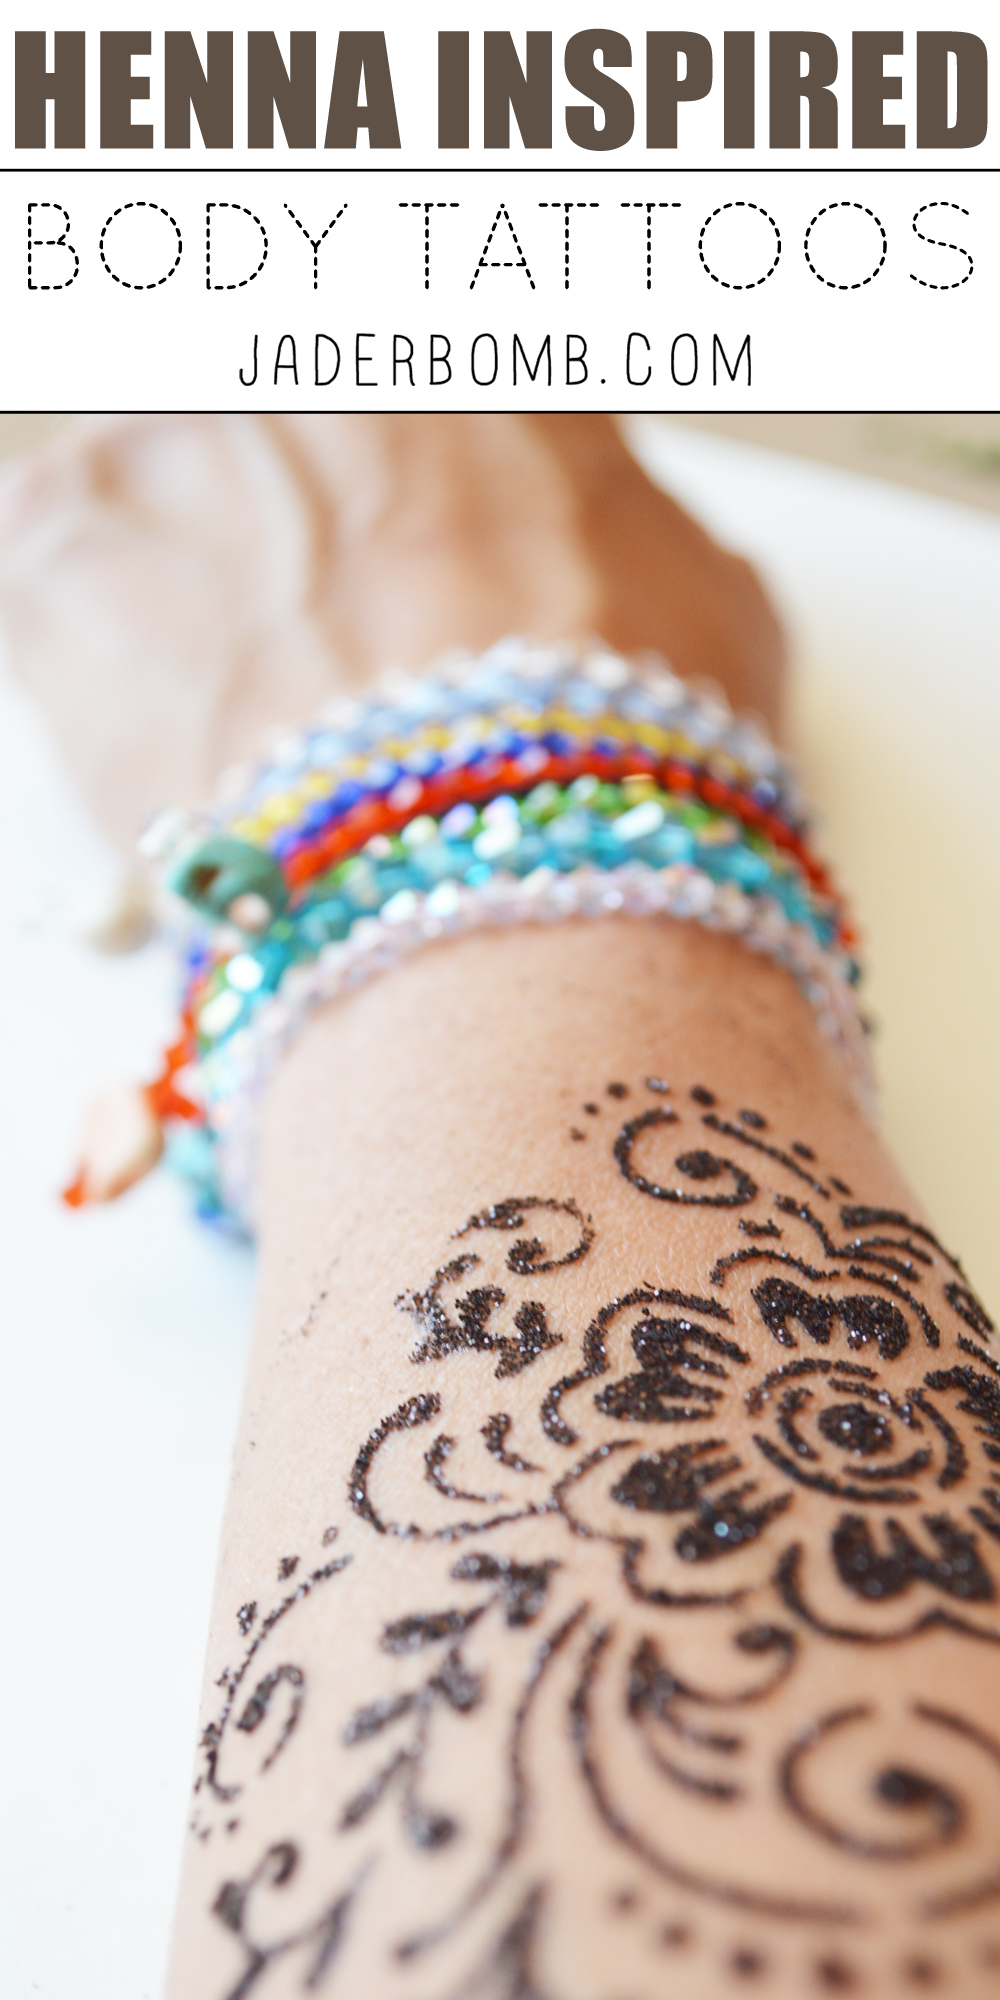 Henna Inspired Body Tattoos